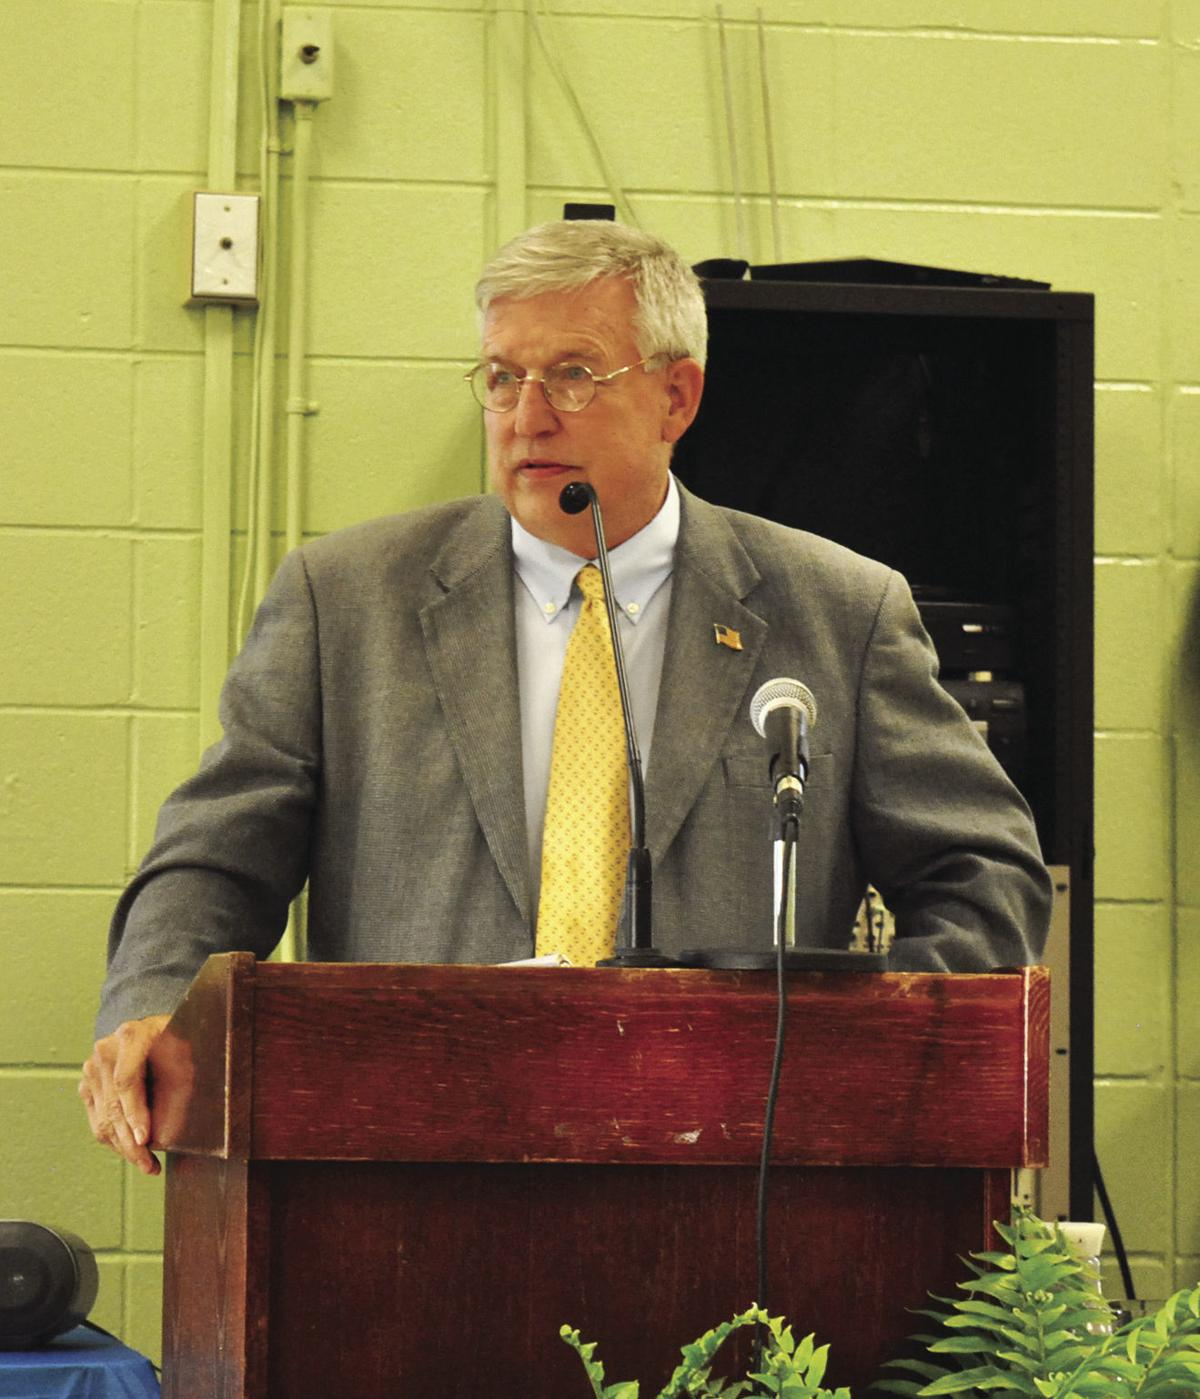 Speaker Bill Crawford